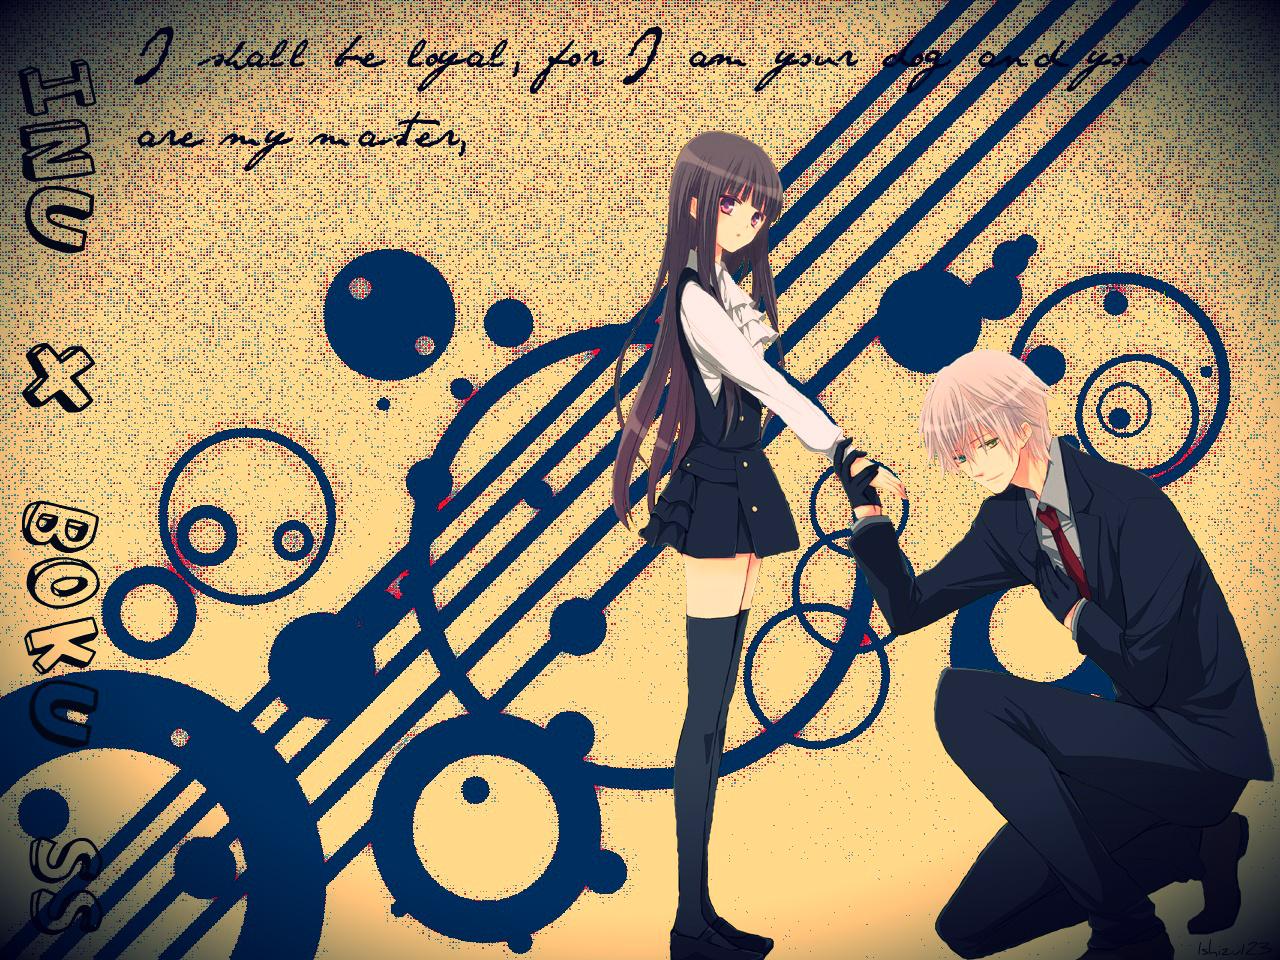 [Resim: inu_x_boku_ss_wallpaper_by_ishizu123-d4mtvz8.jpg]